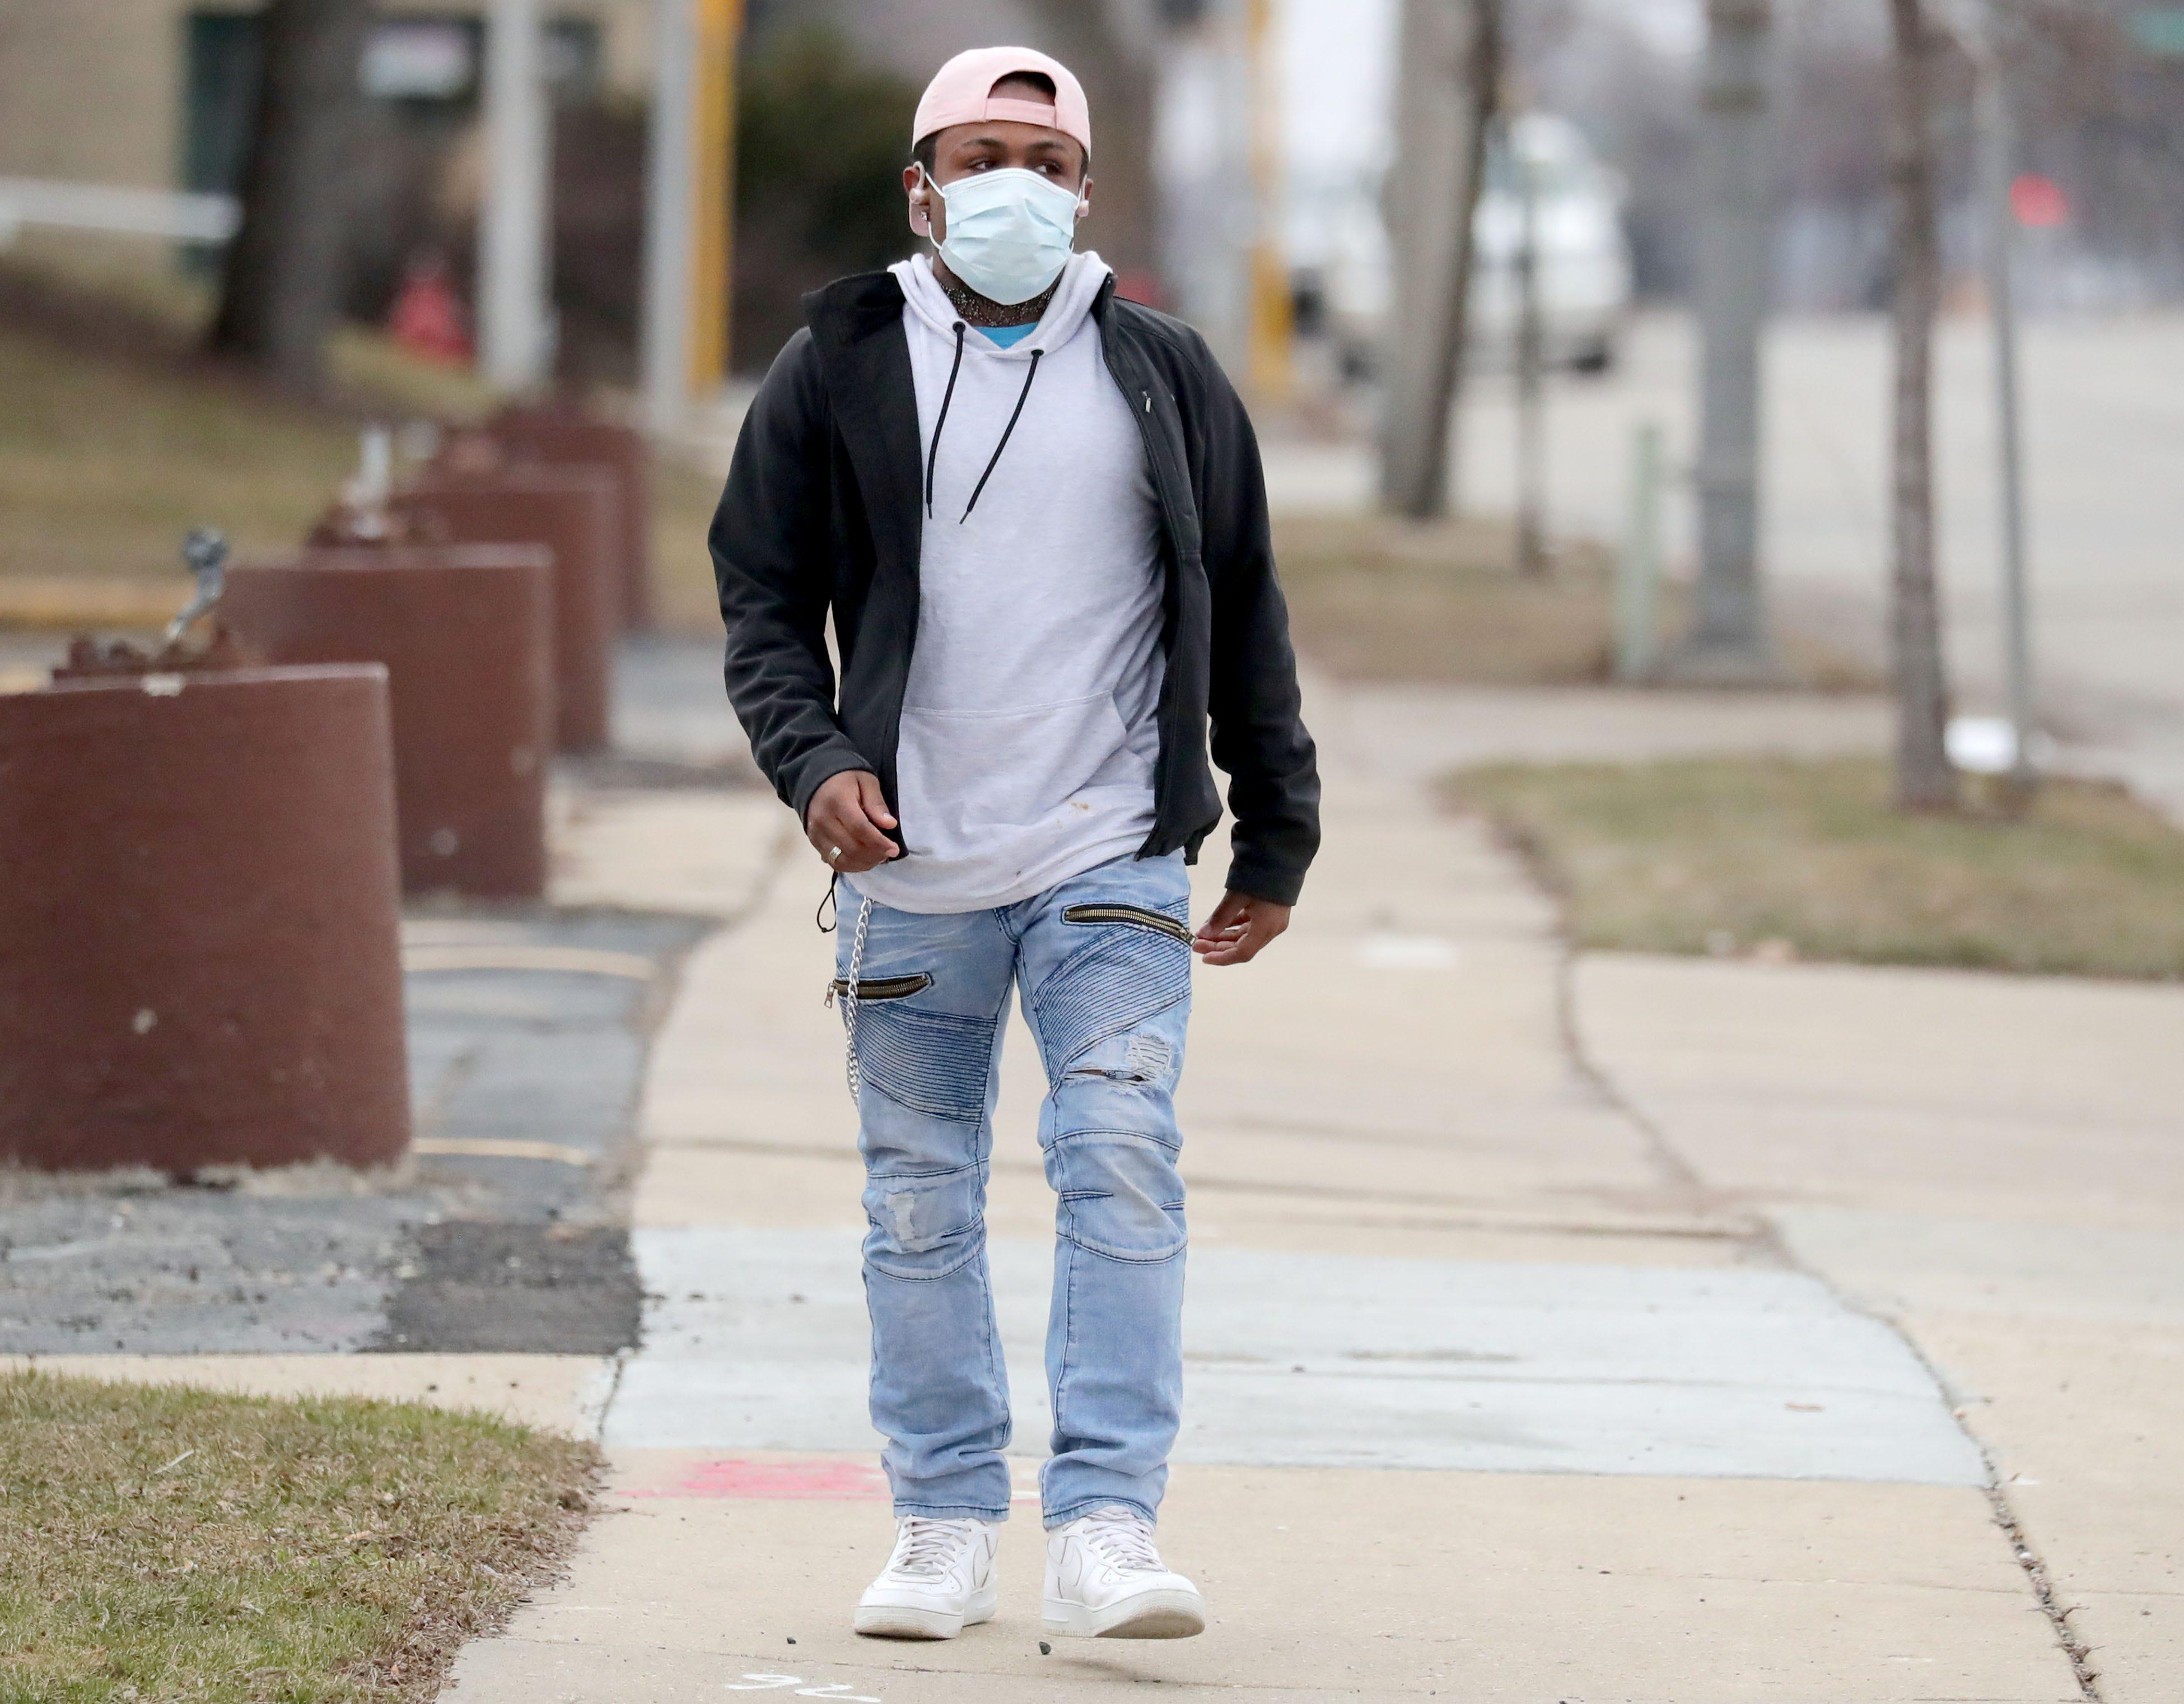 Wisconsin could get at least $2 billion under coronavirus stimulus plan